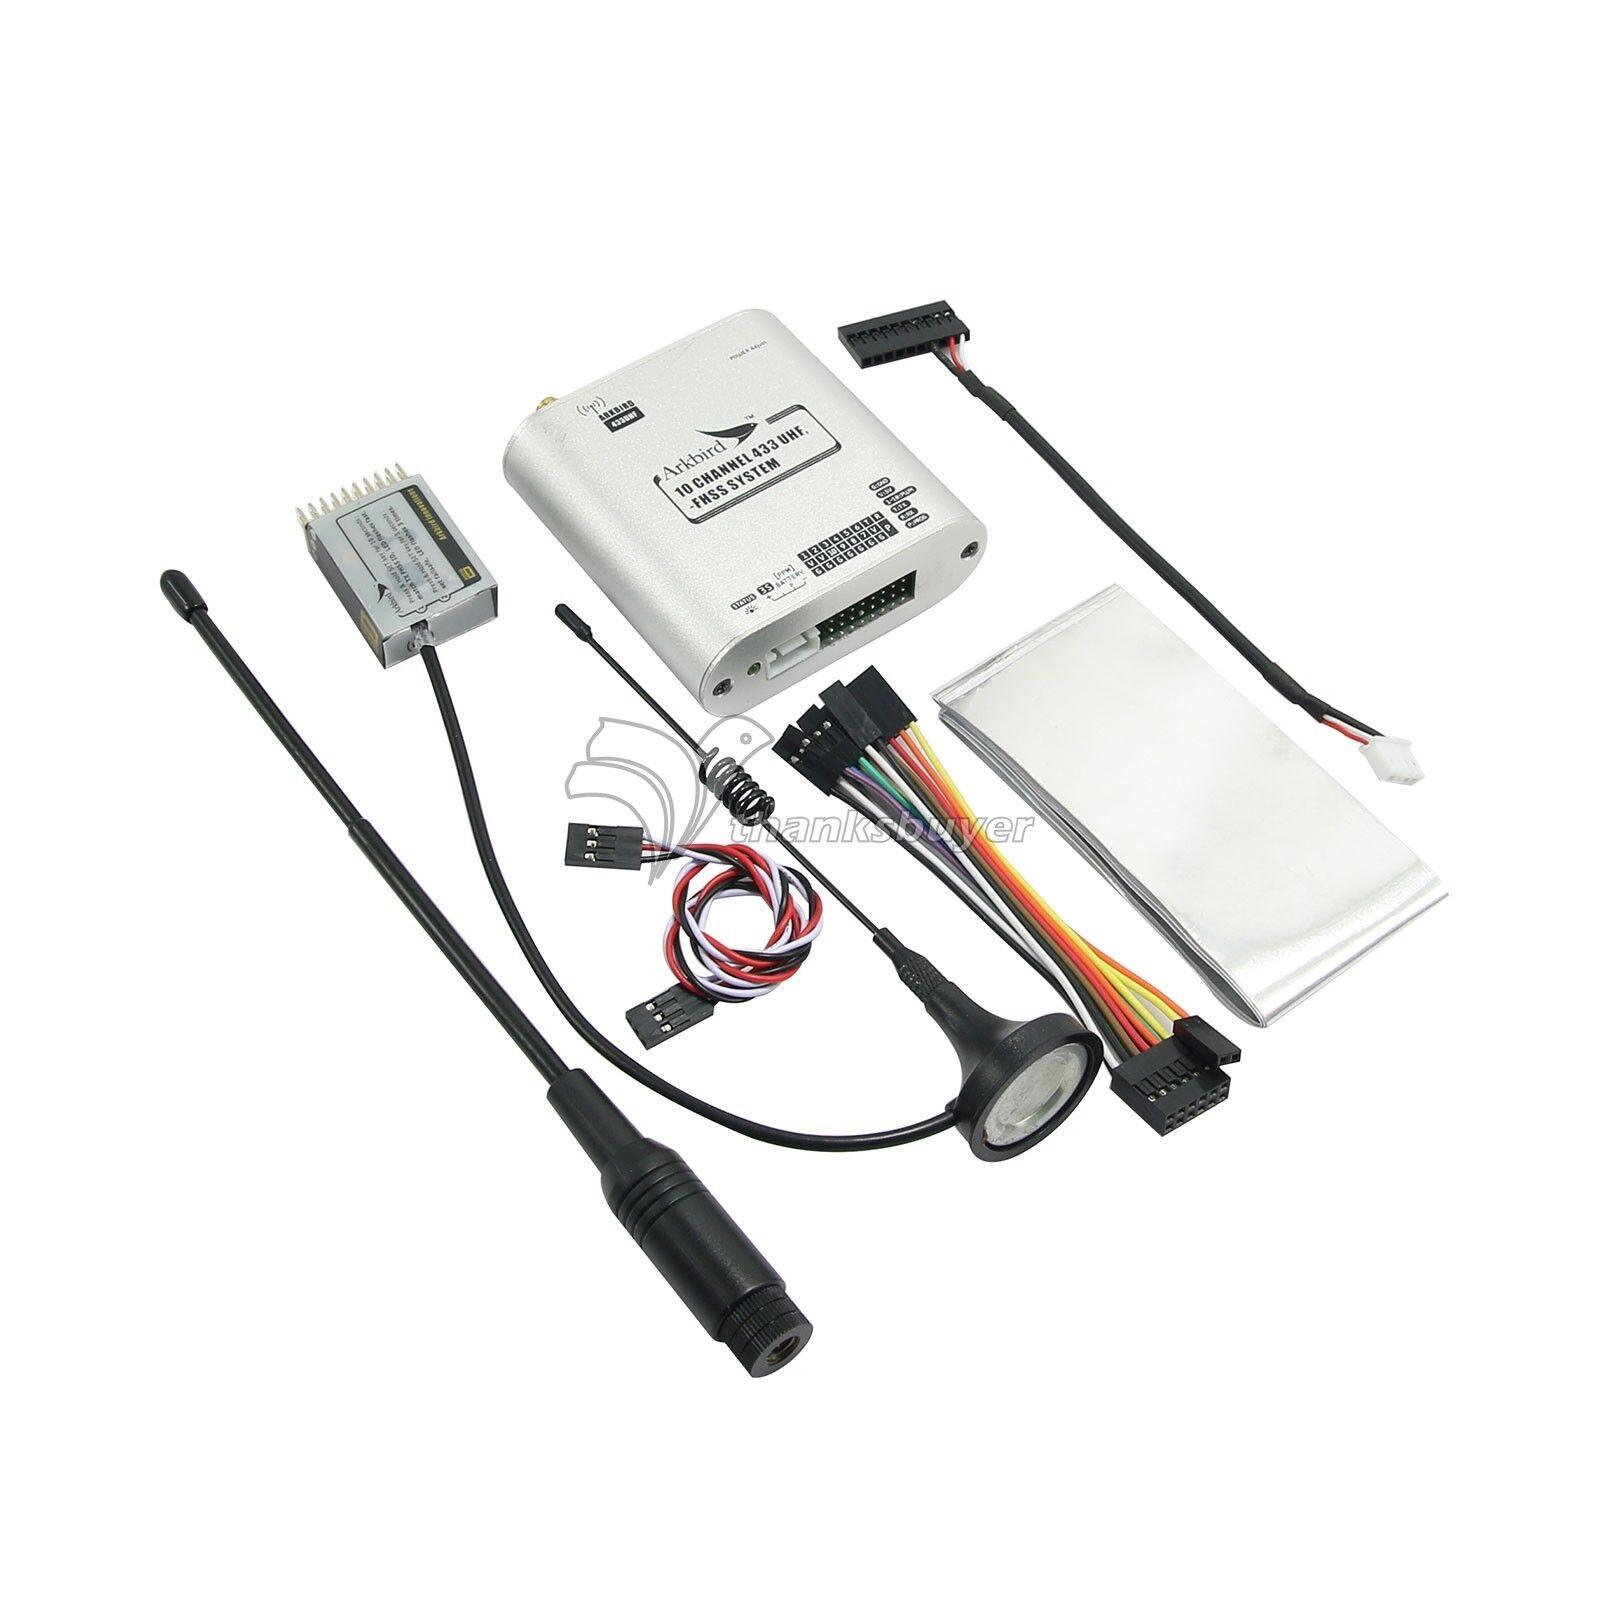 Arkbird Largo Alcance Uhf 433 Mhz Fpv Rc Sistema De Control Tx rx Transmisor Y Receptor